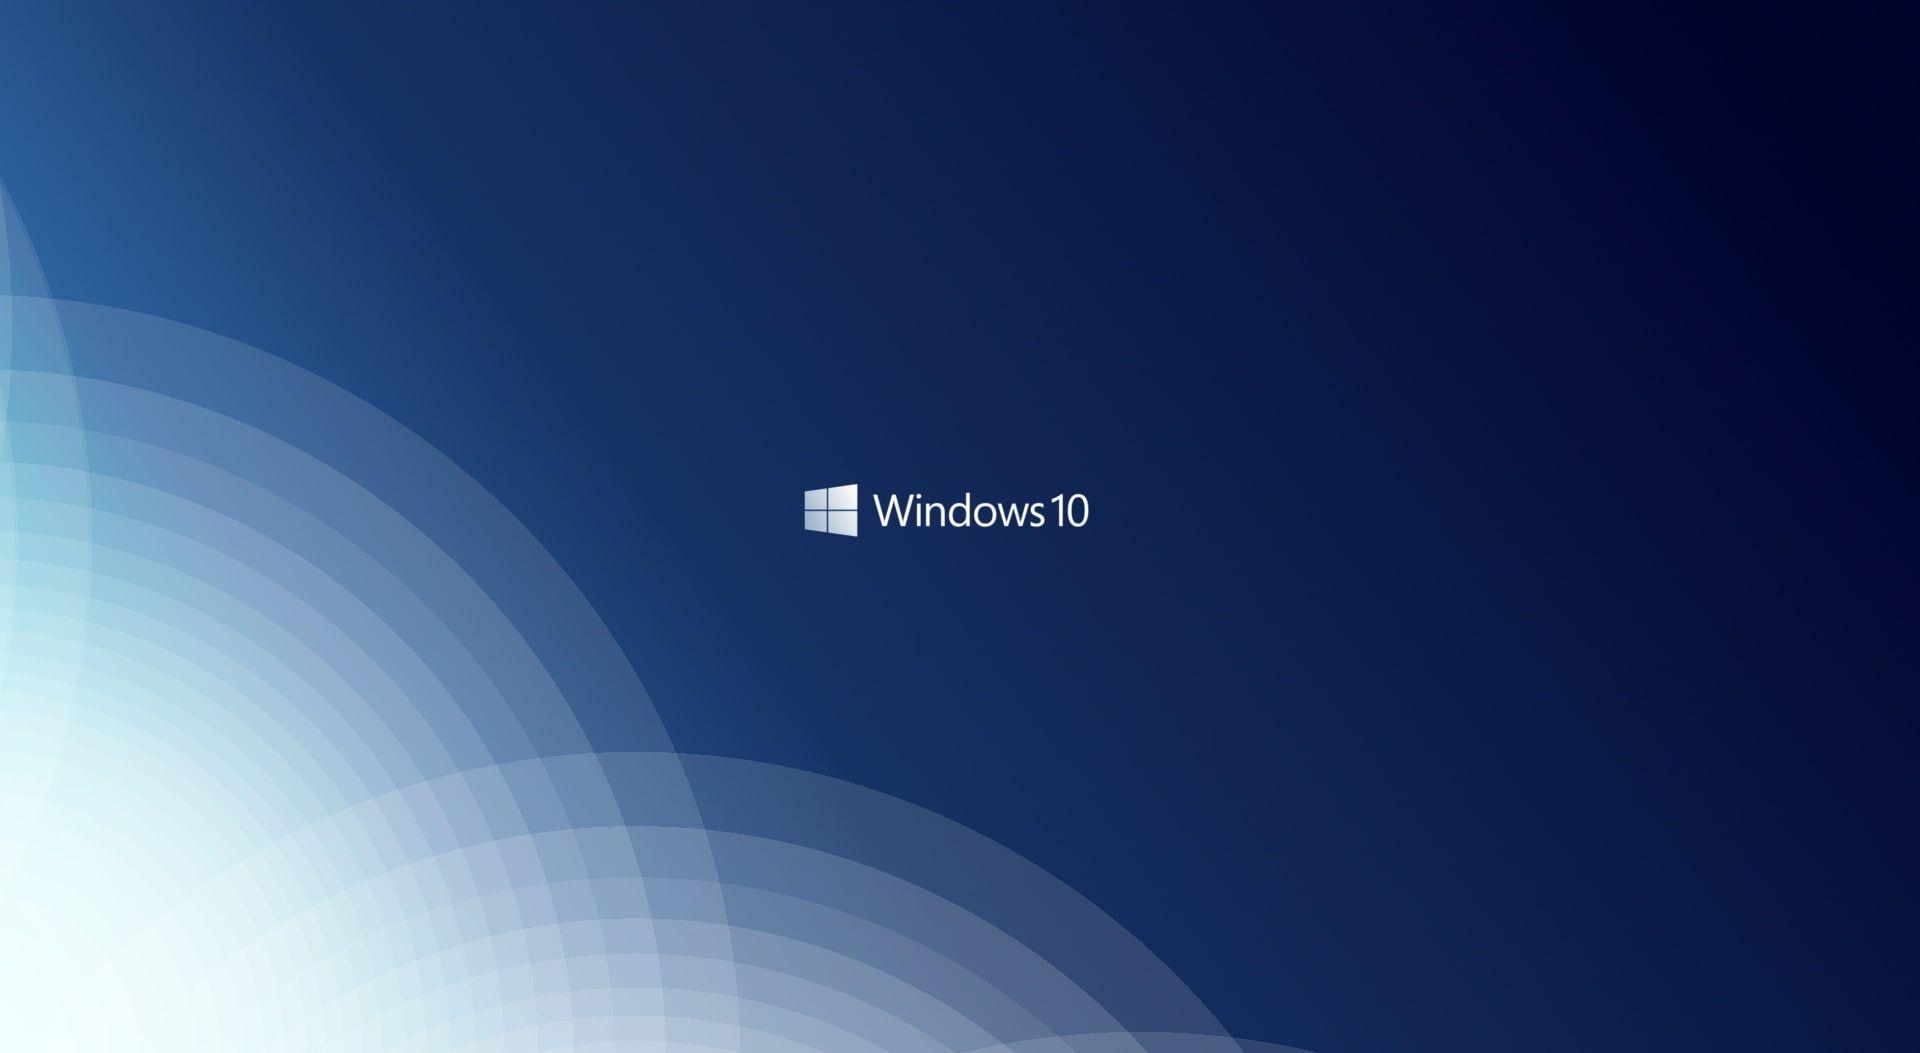 Windows 10 Windows 10 Logo Windows Windows 10 Logo Minimal Minimalism Minimalistic Abstract Windows Window Windows 10 Logo Latest Hd Wallpapers Windows